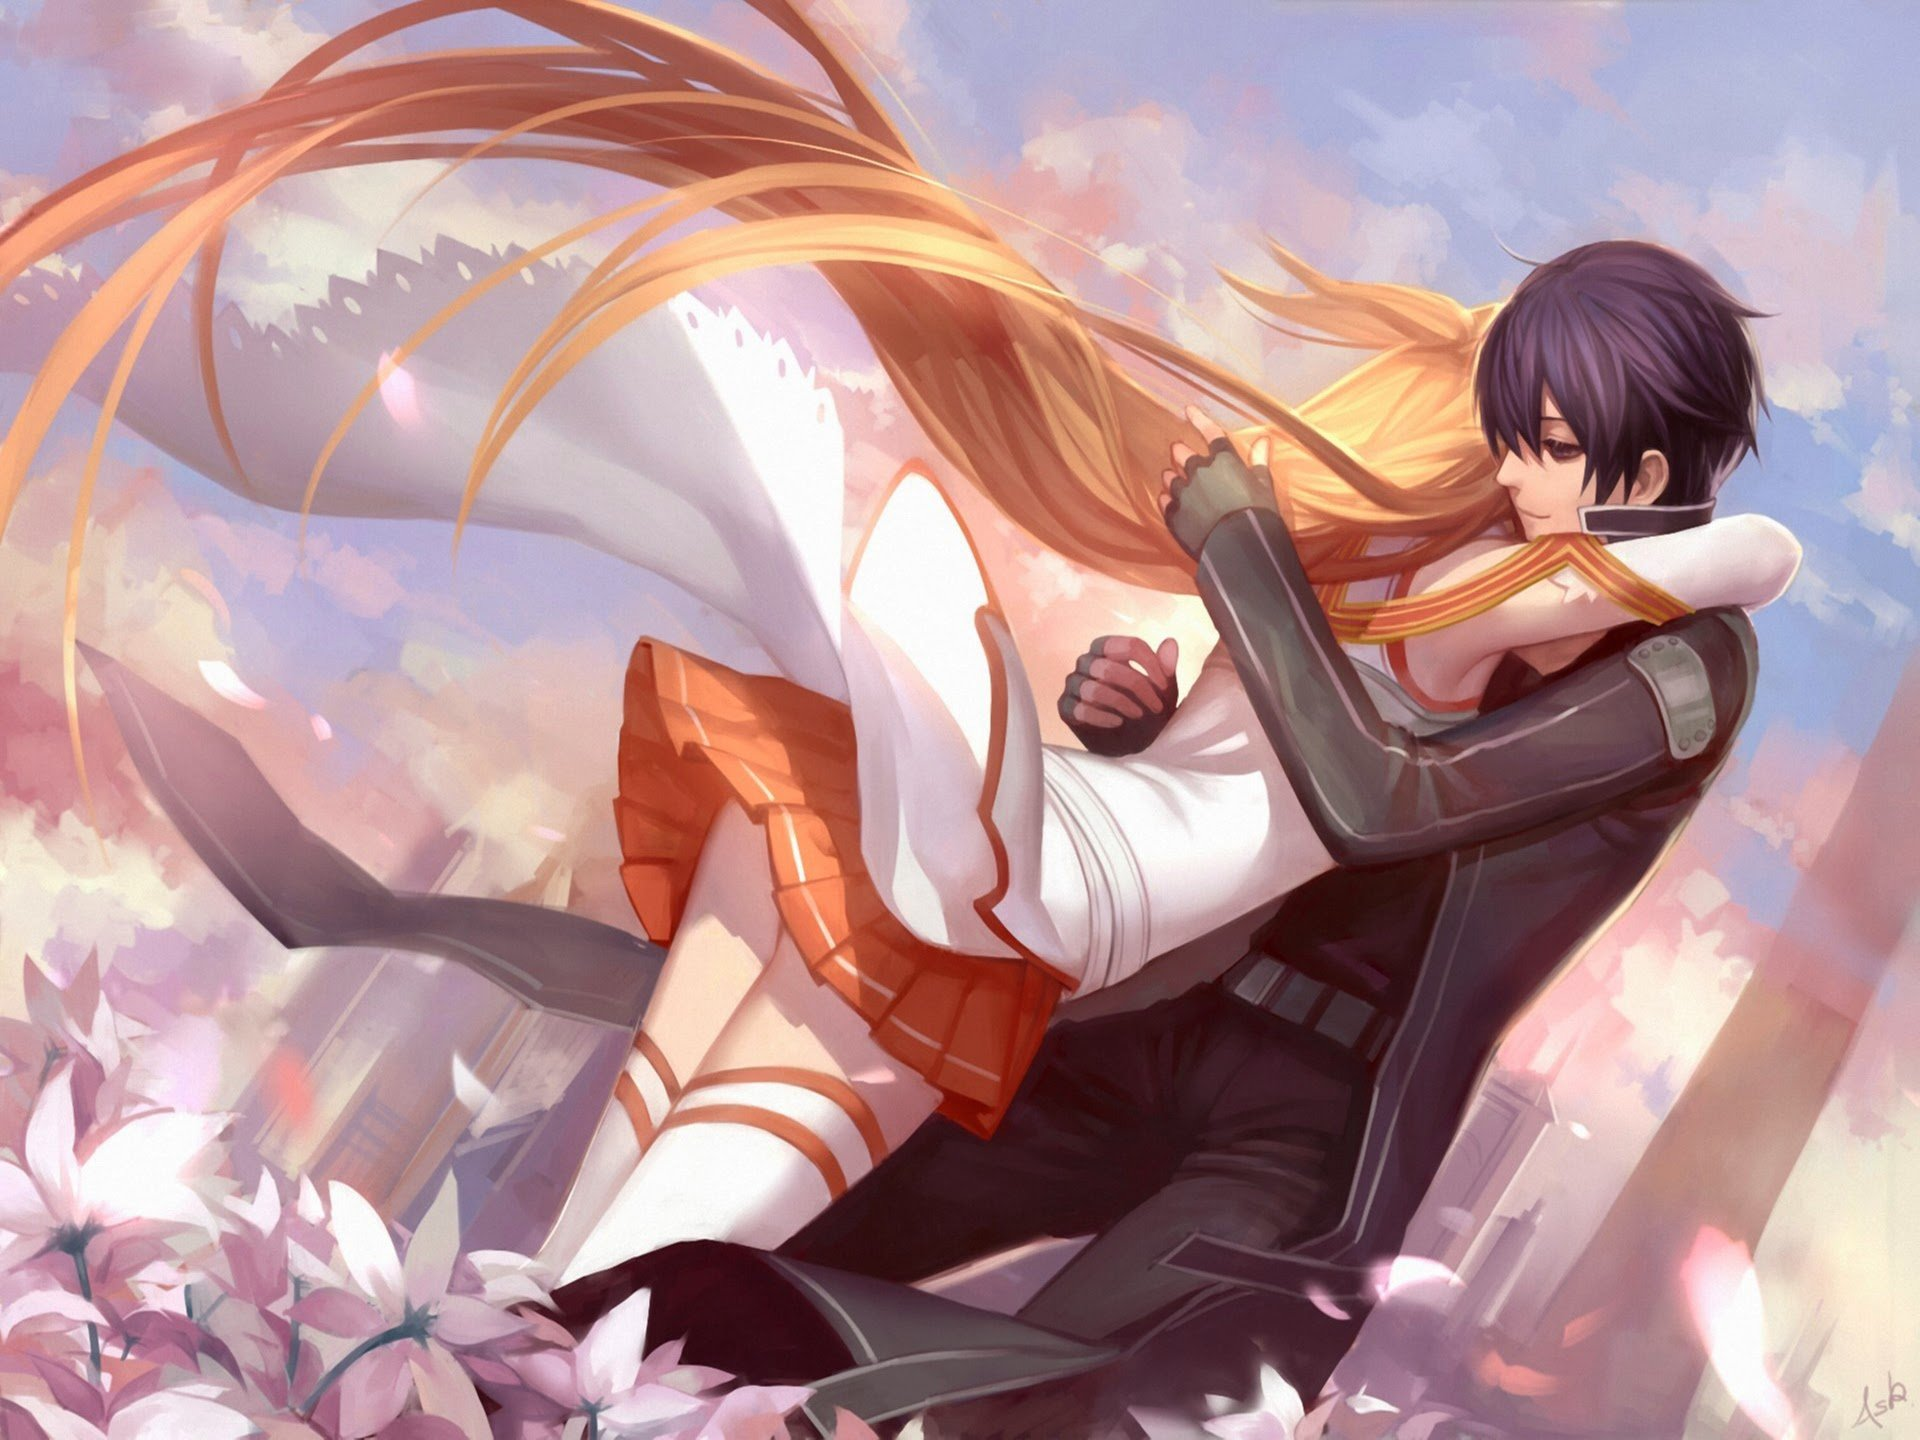 Asuna kirito couple hug sword art online anime hd wallpaper 1920x1440